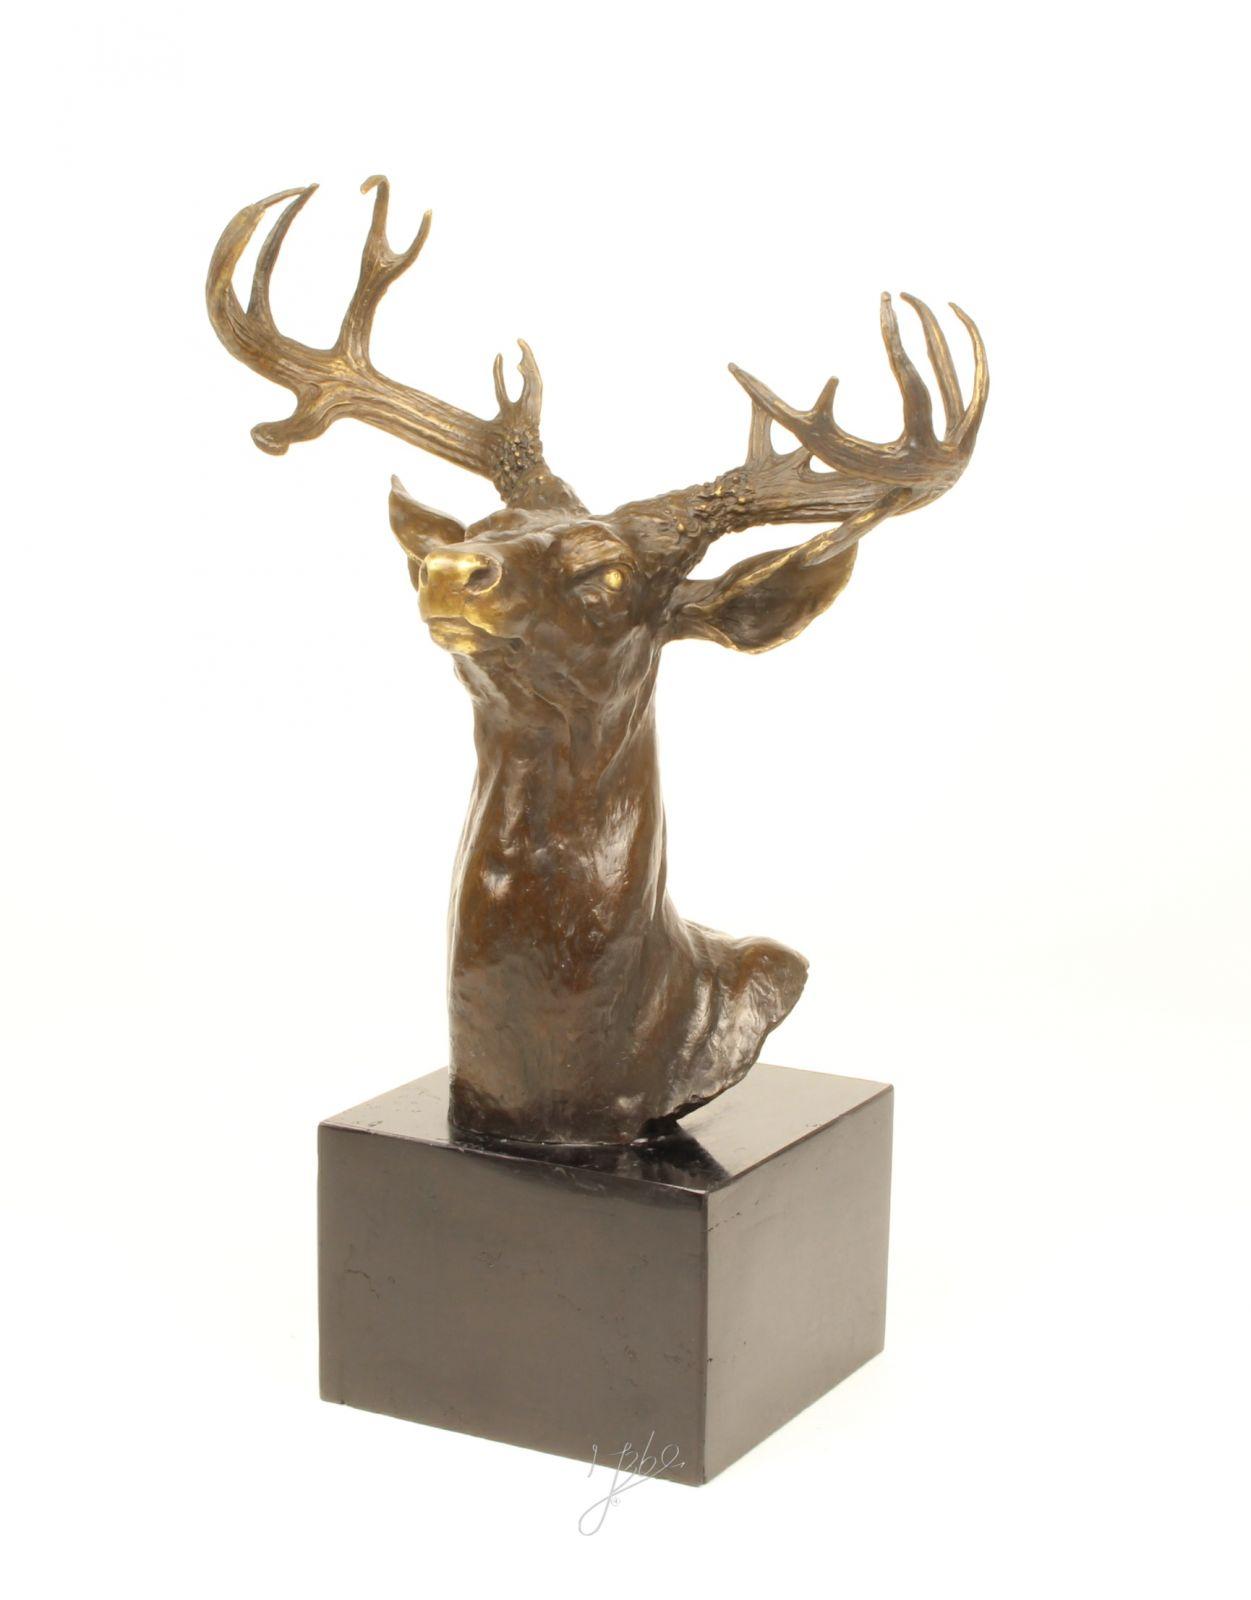 Hlava jelena z bronzu.